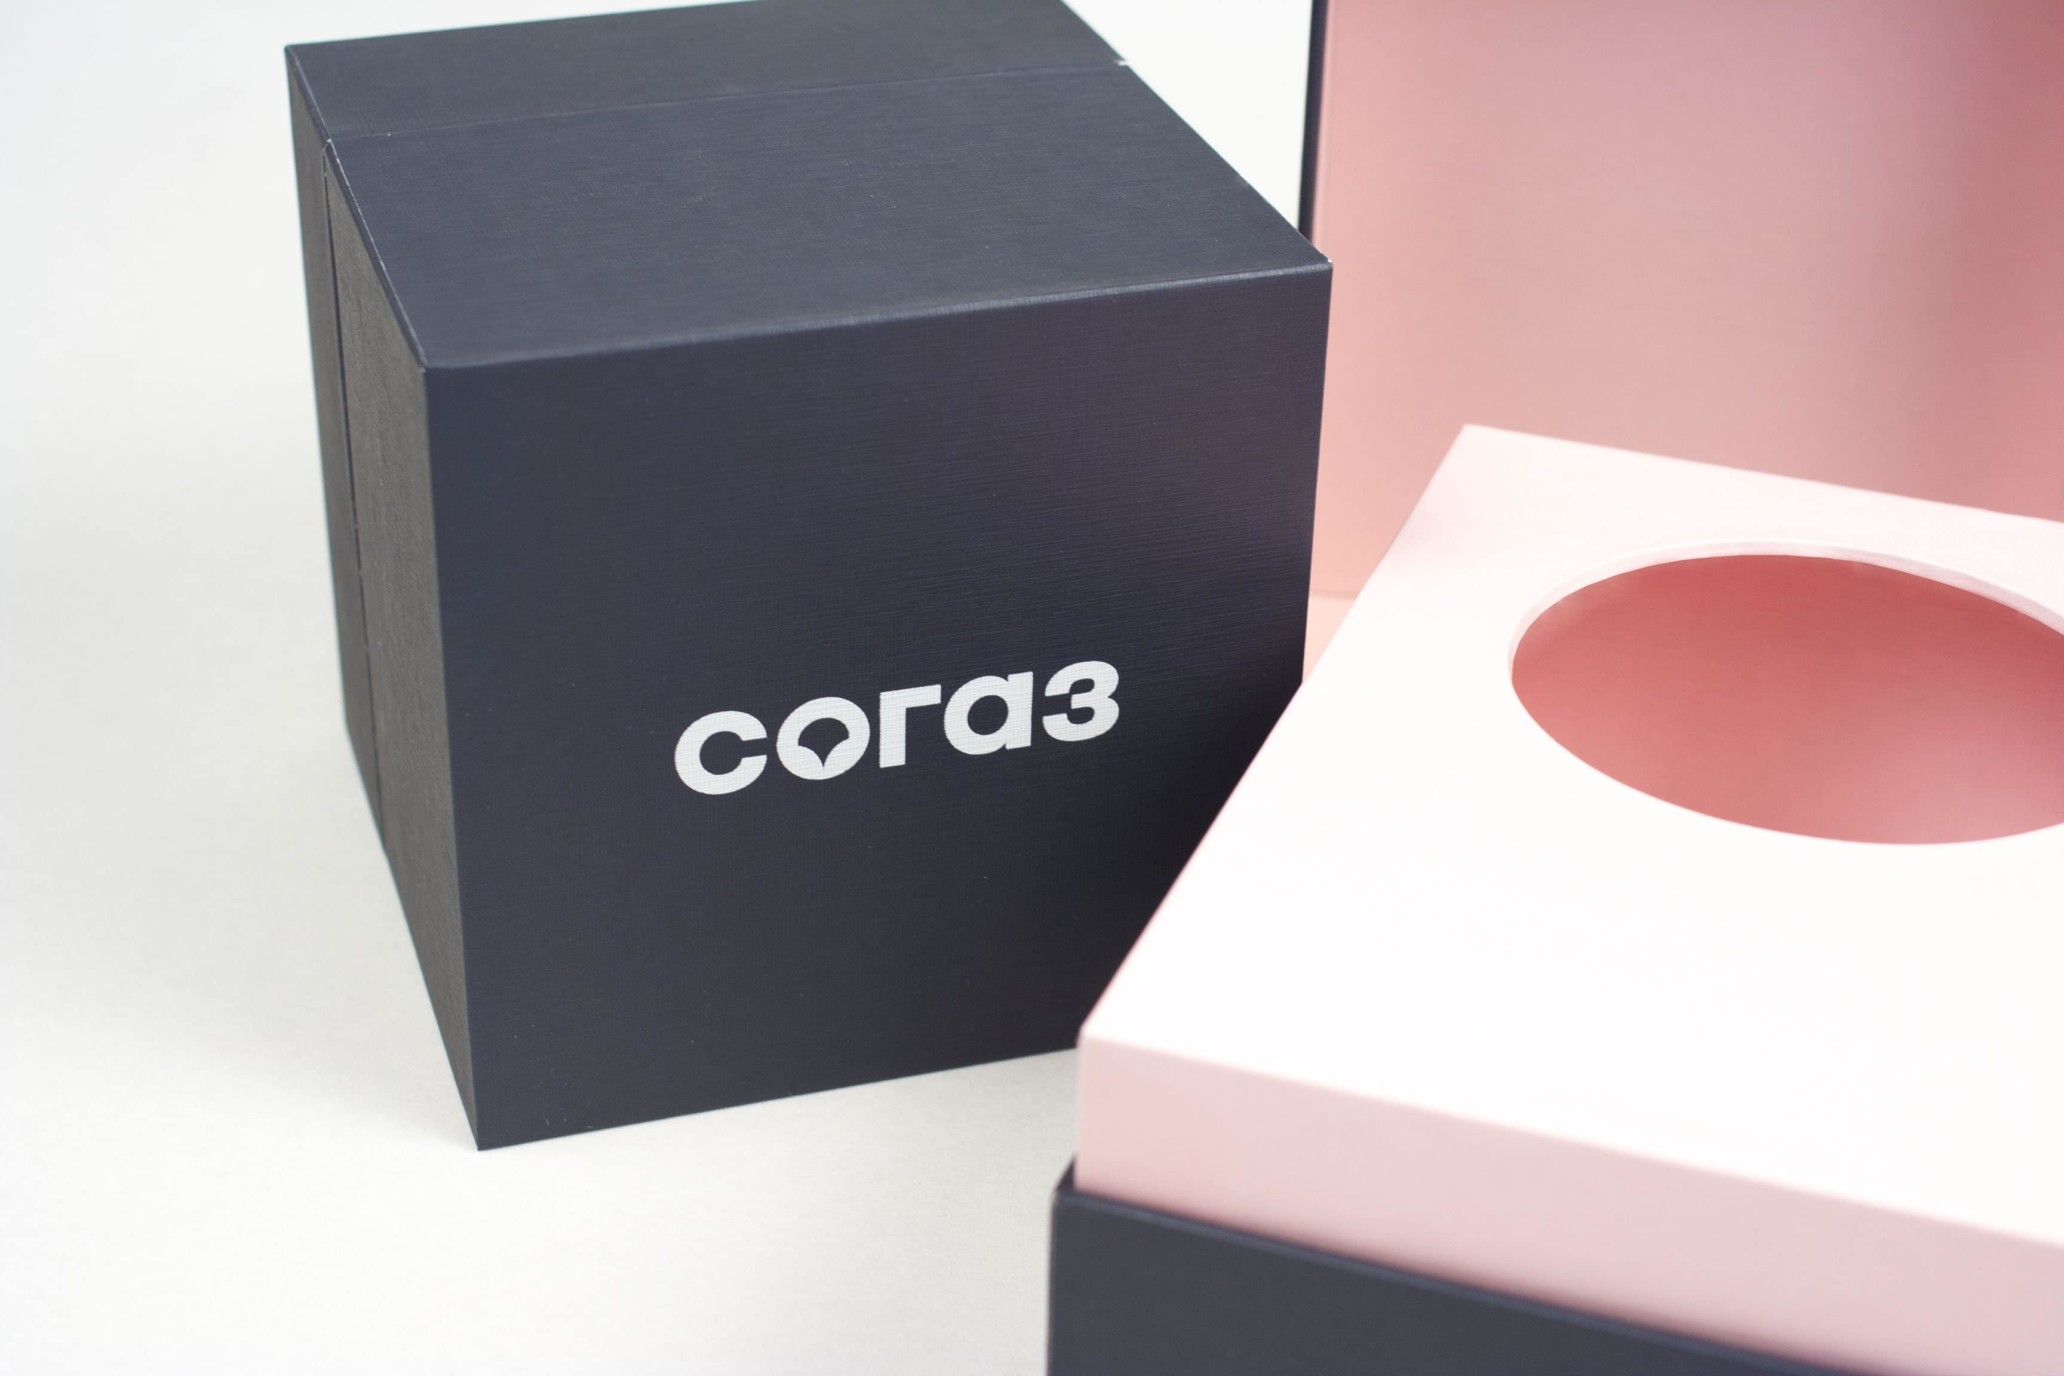 Коробки под диффузор с логотипом, заказ СОГАЗ